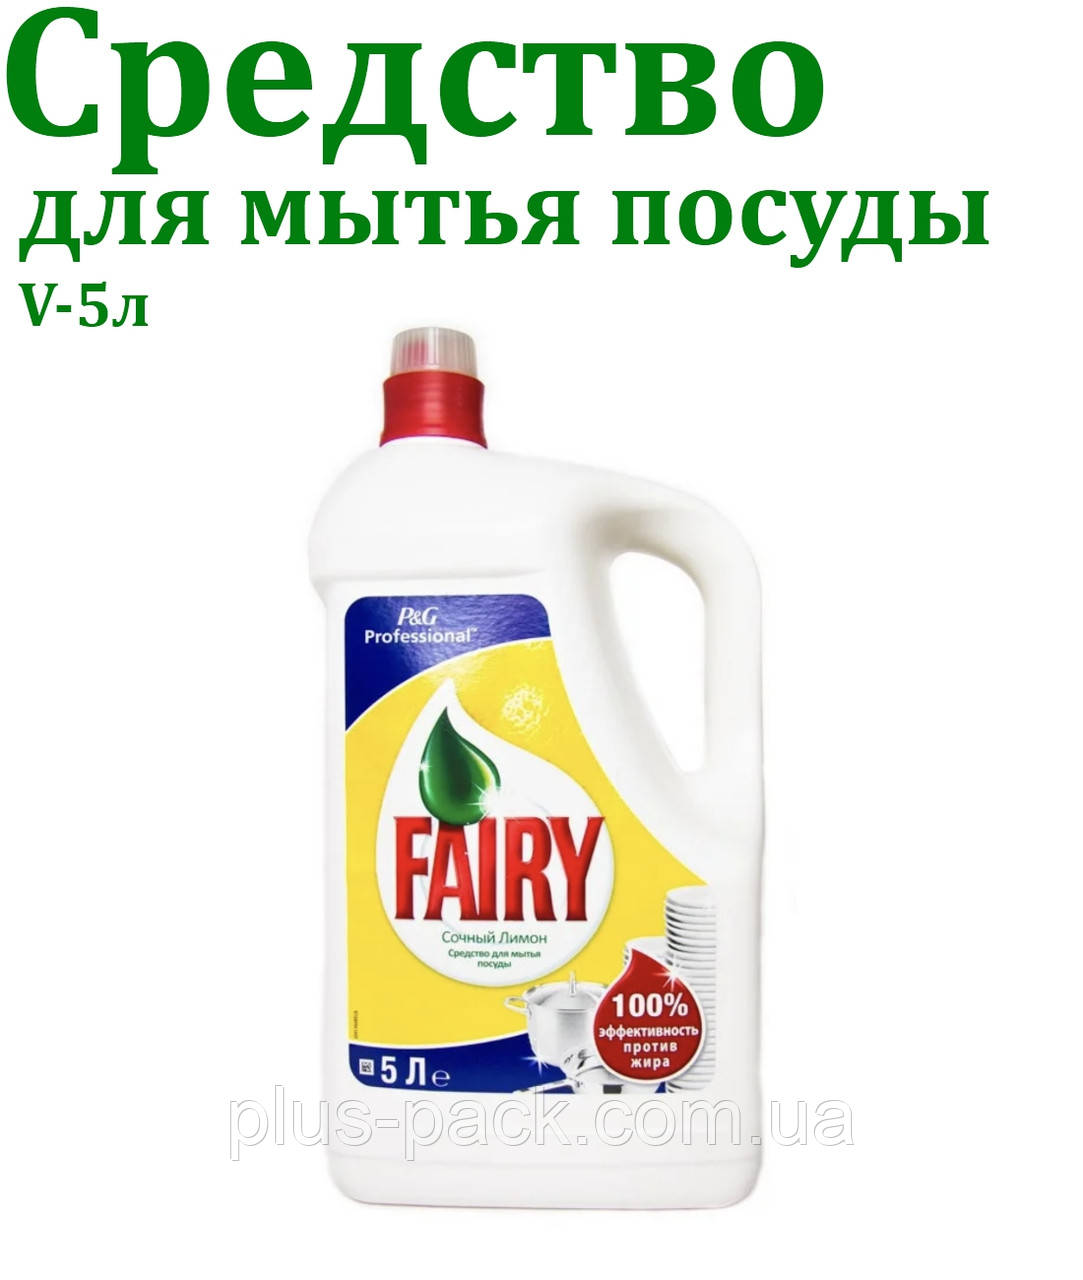 Средство для мытья посуды Fairy, 5л